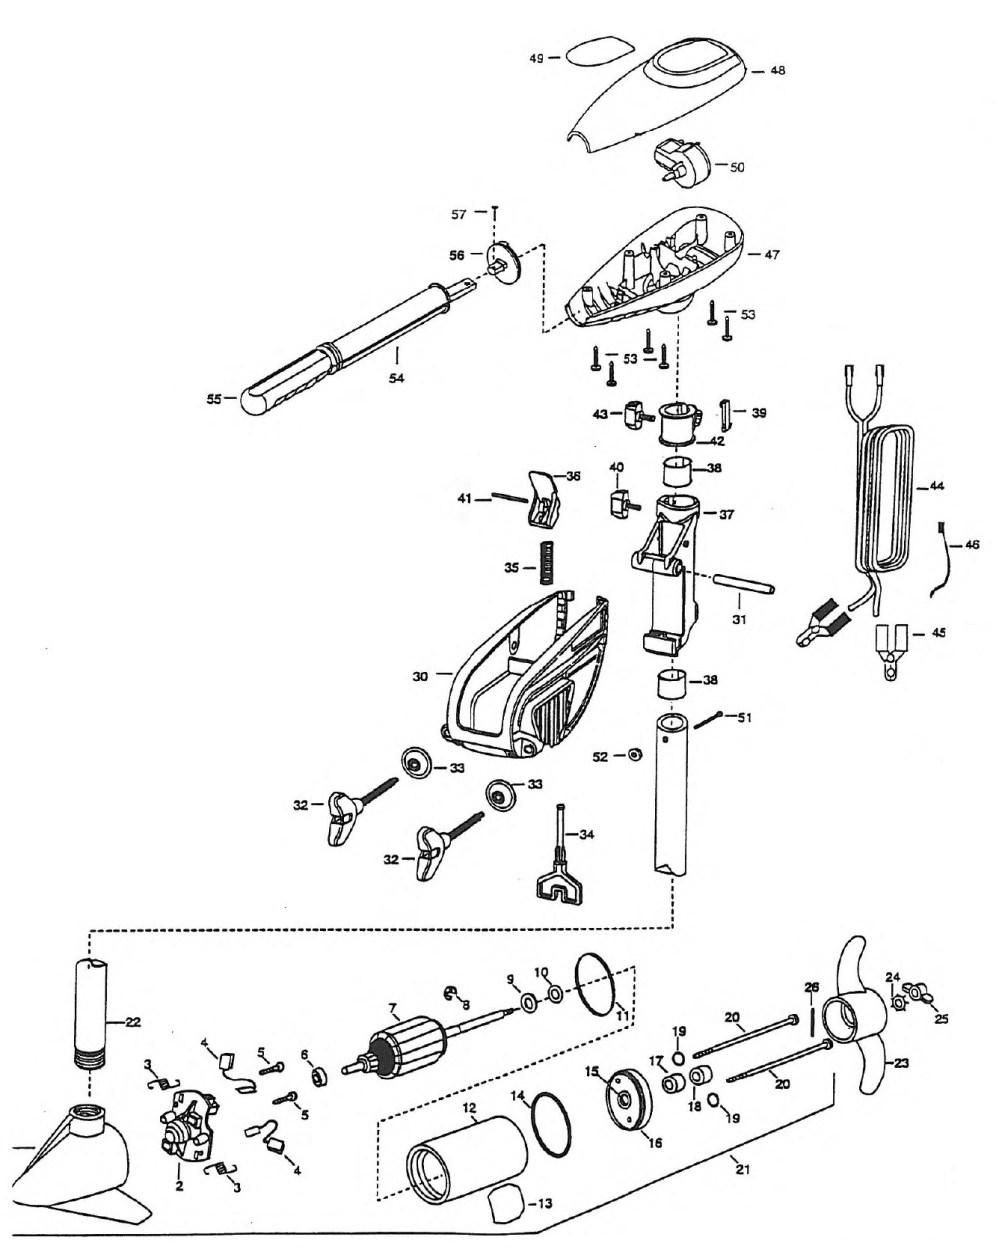 medium resolution of minn kota powerdrive wiring diagram wiring diagram technicwiring diagram minn kota power drive 55 i pilot